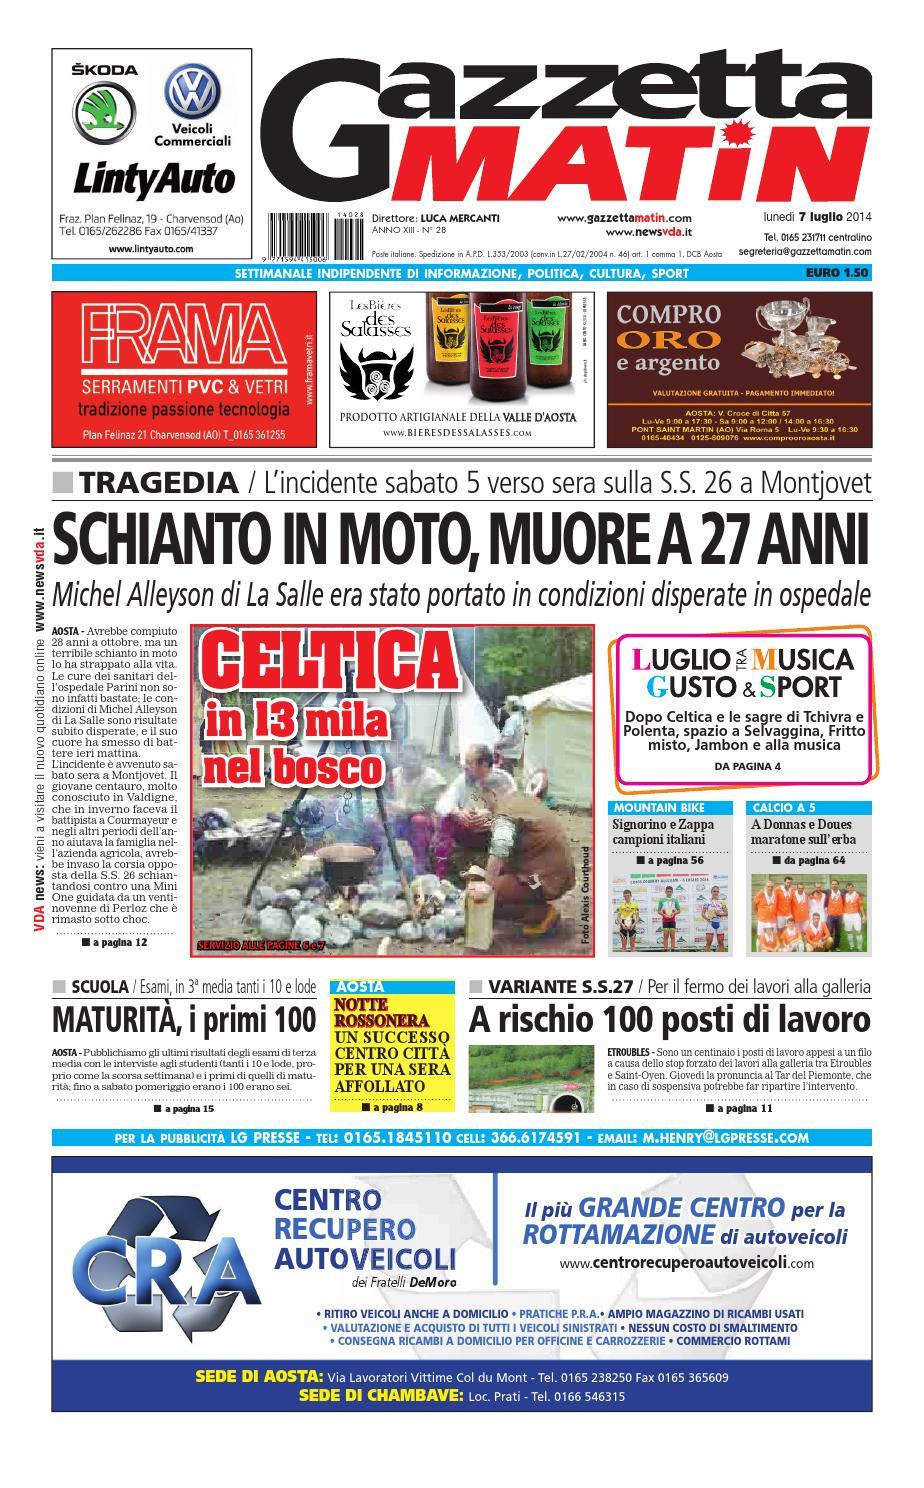 Gazzetta Matin del 07 luglio 2014 by Luca Mercanti - issuu 4a4a5a648740